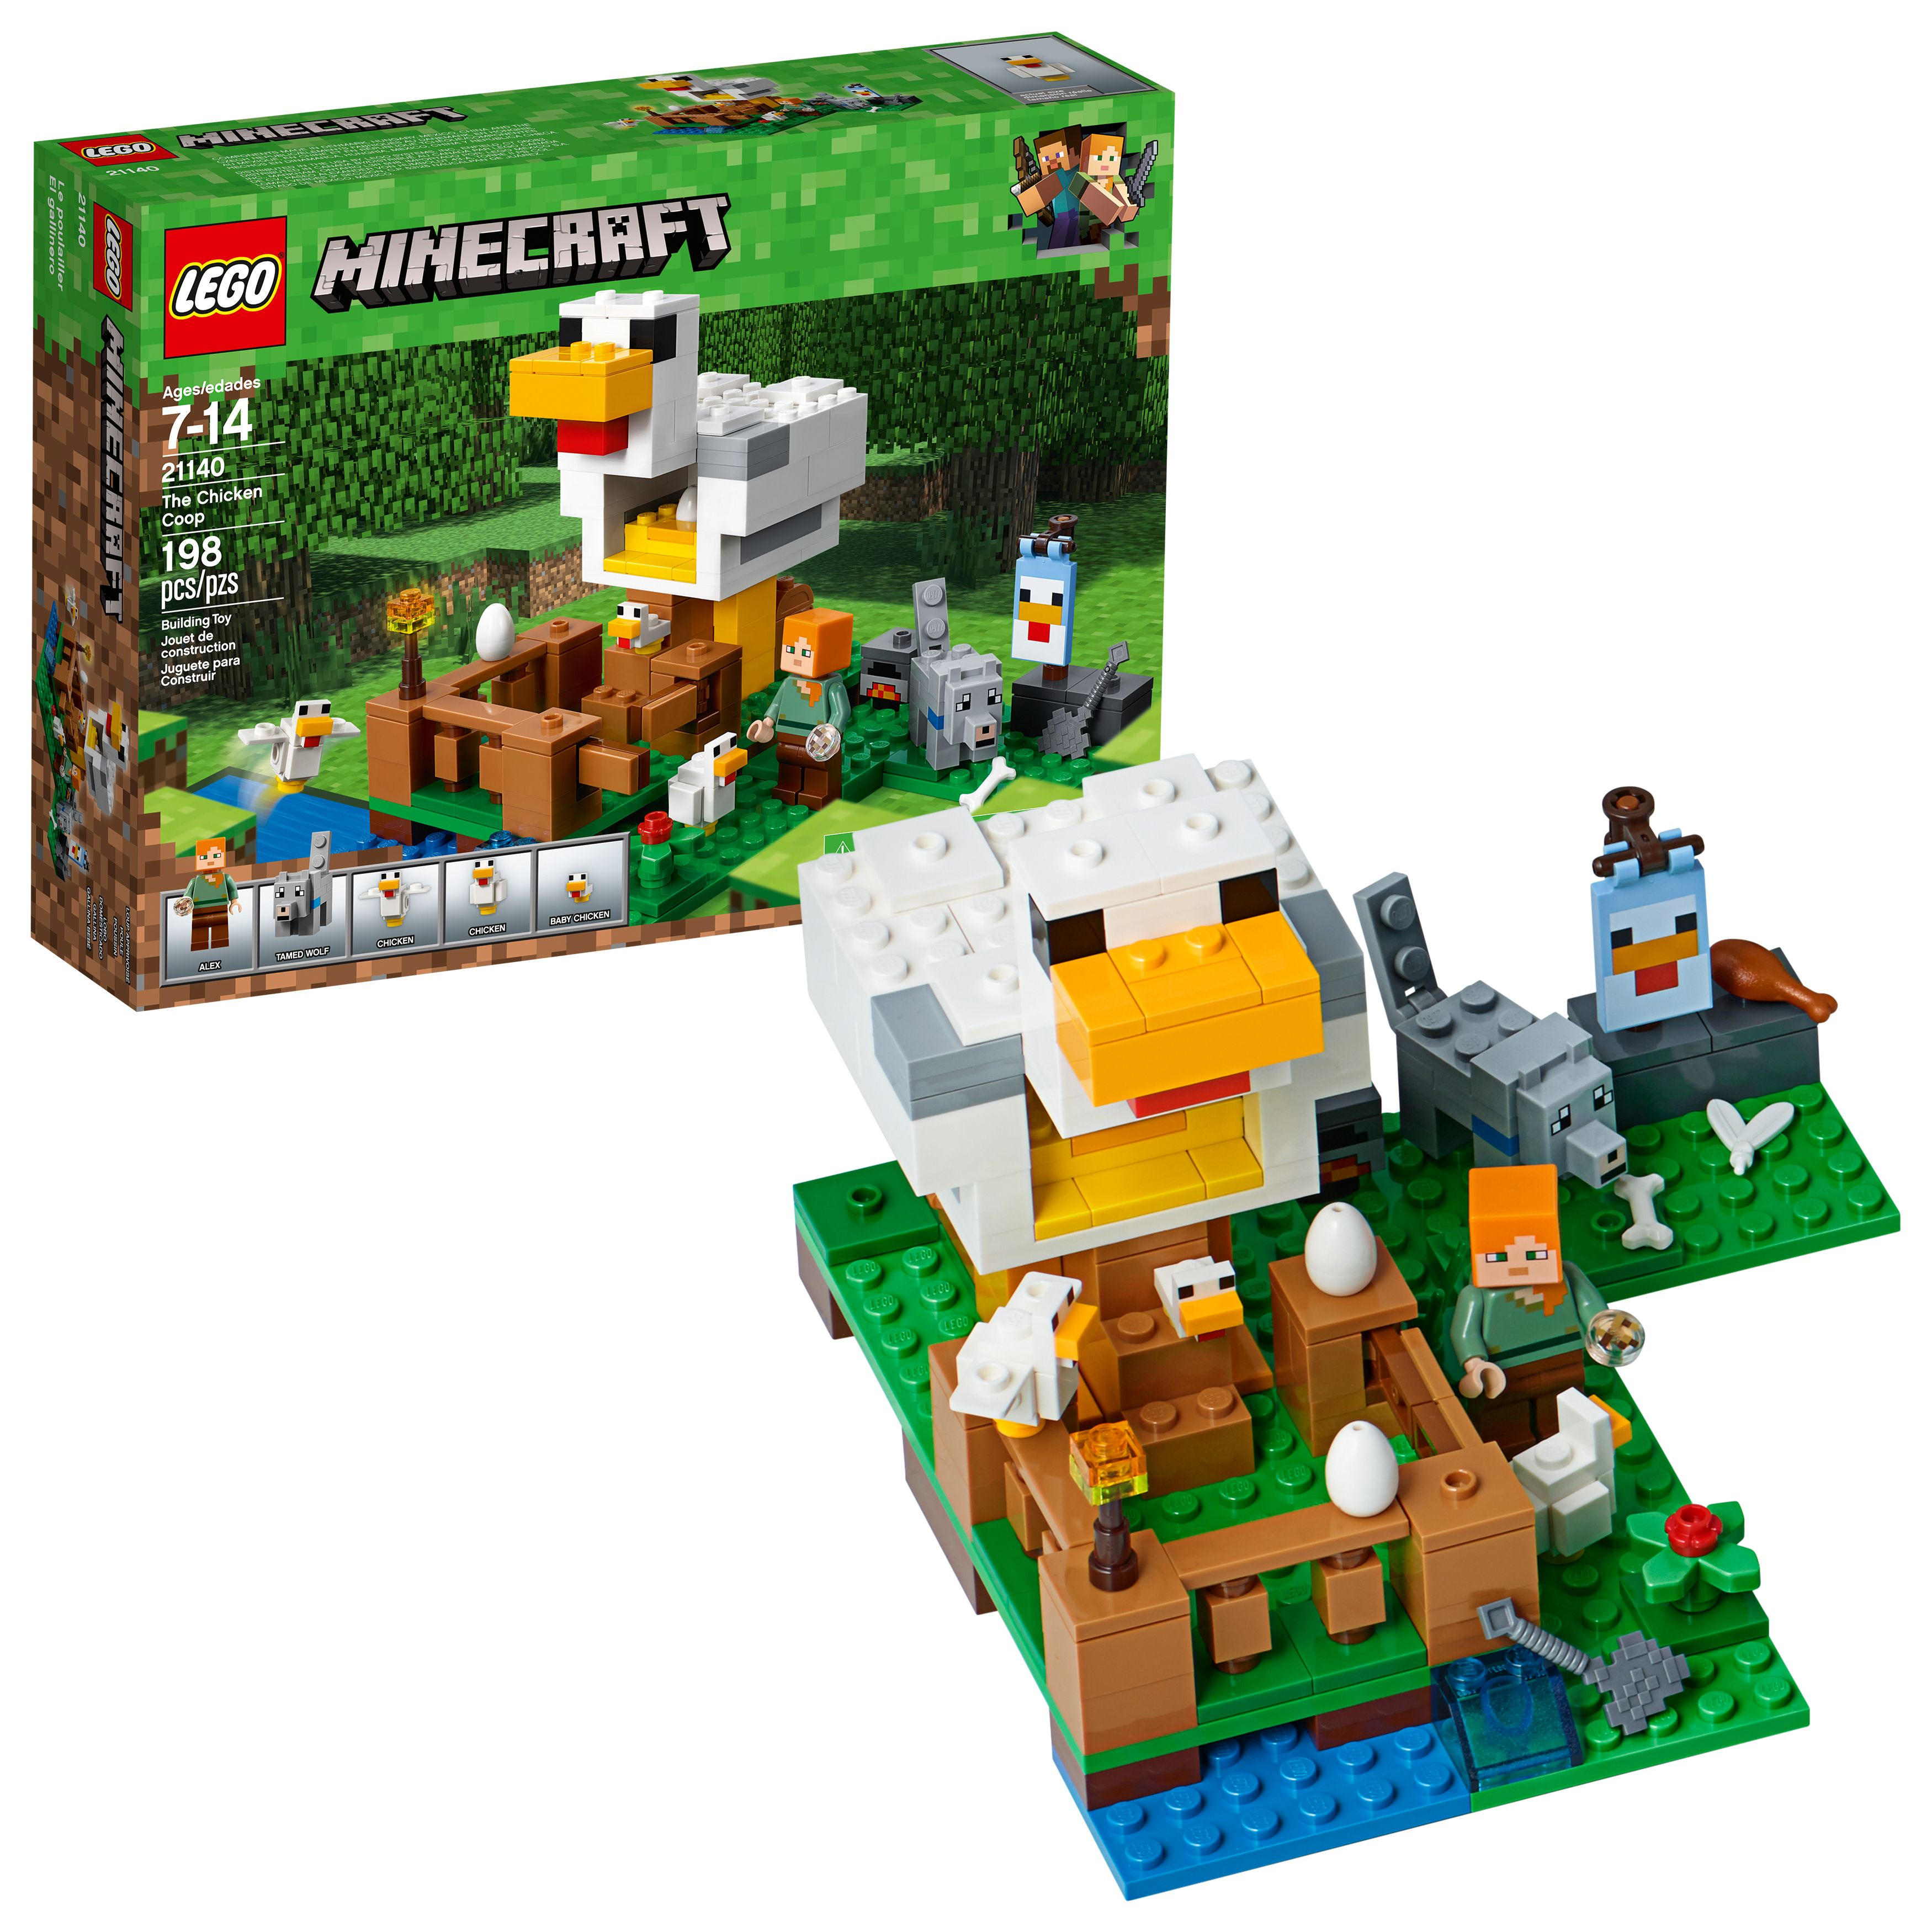 Toys Lego minecraft, Minecraft, Lego sets